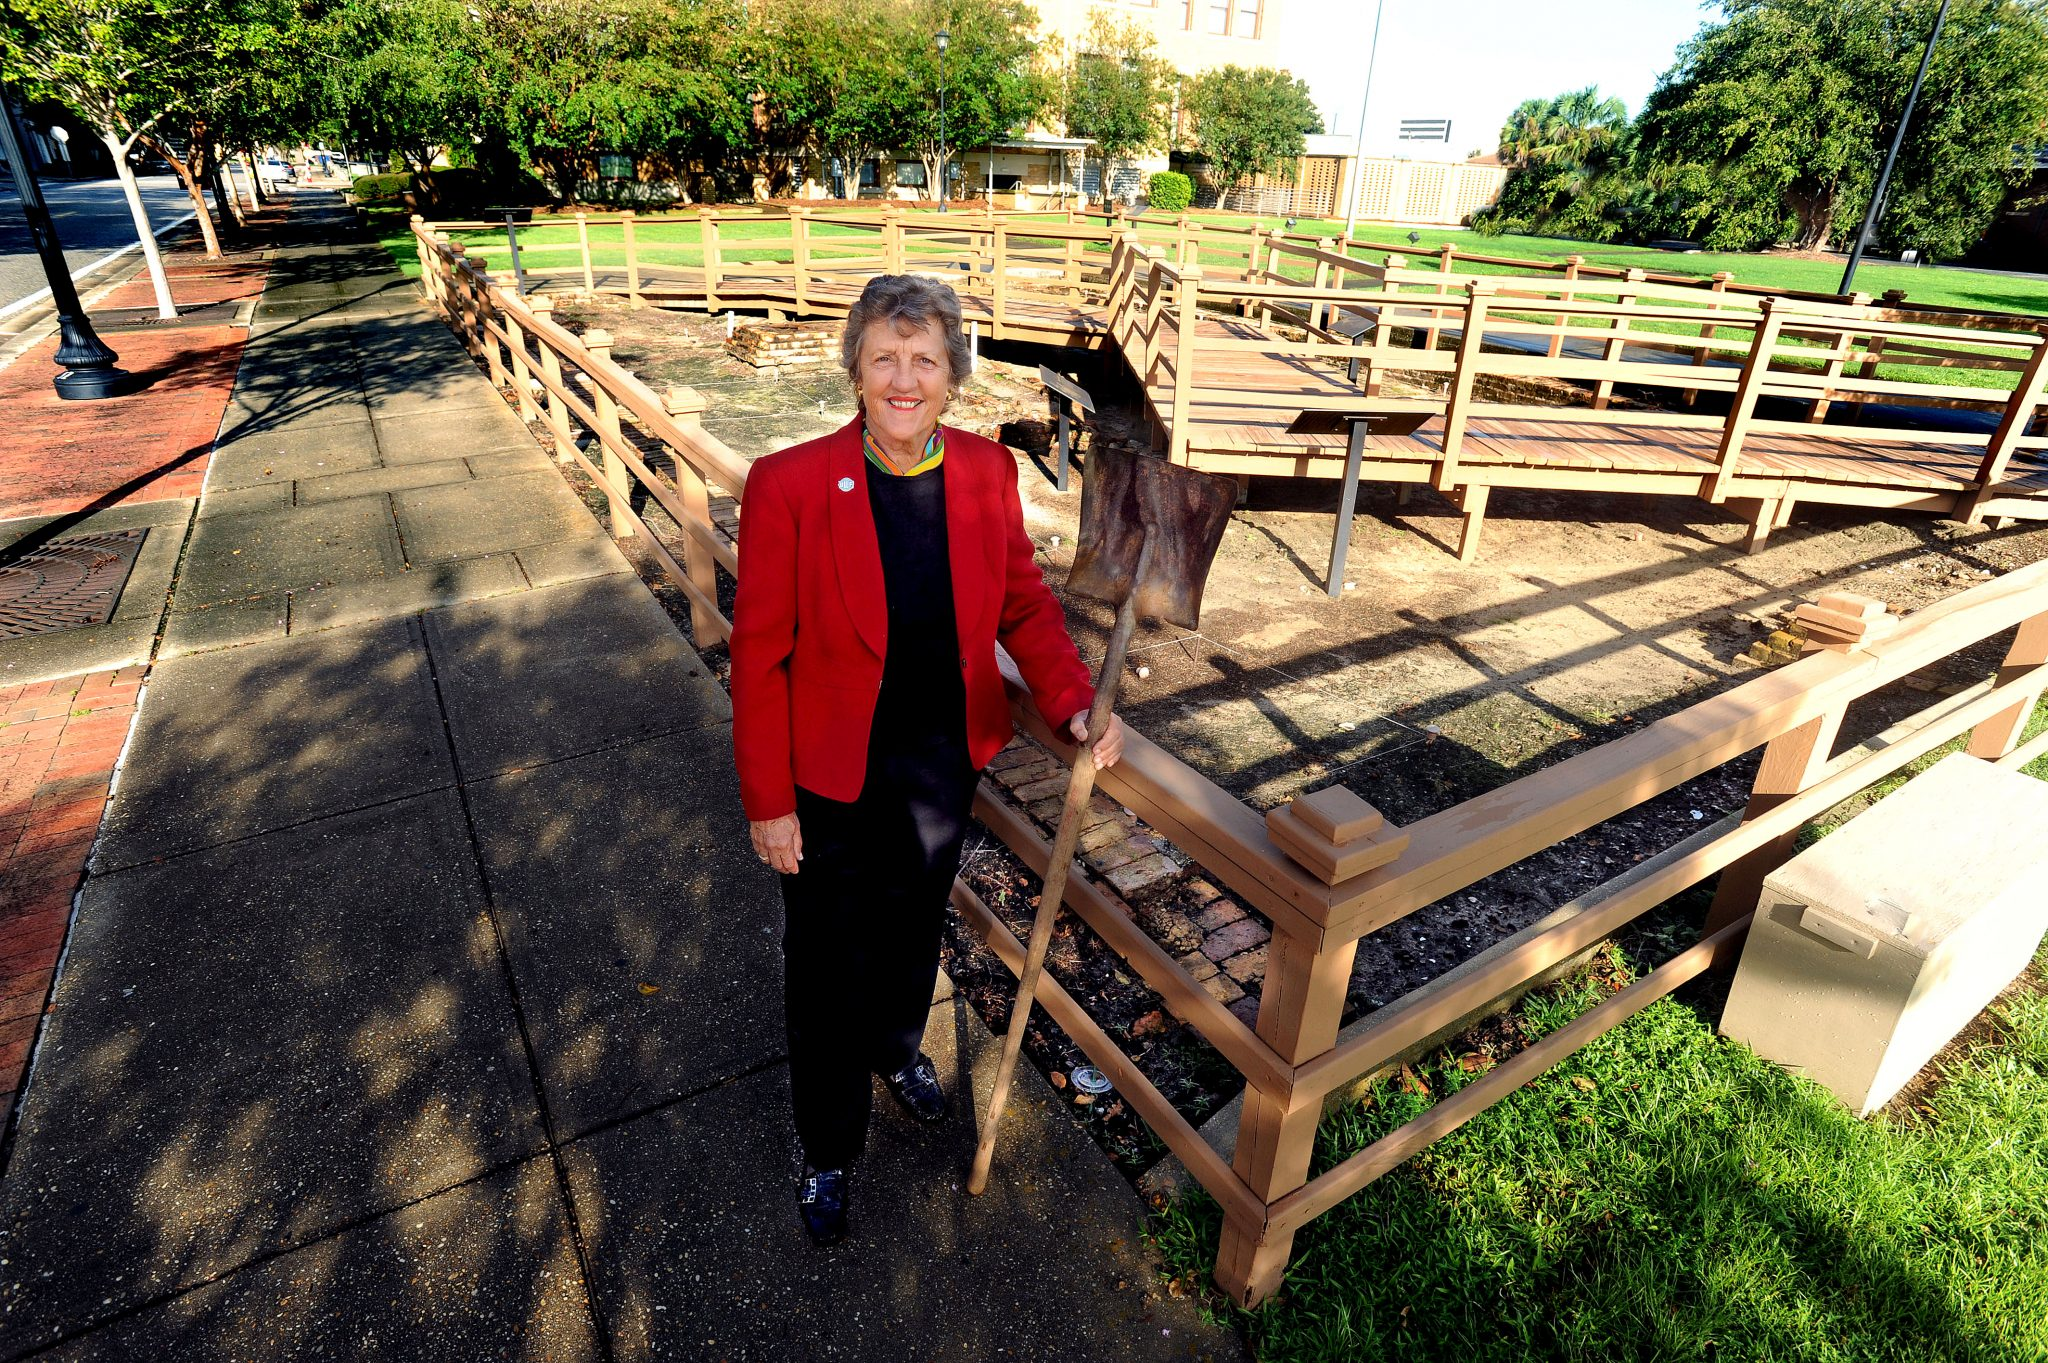 President Emeritus Judy Bense